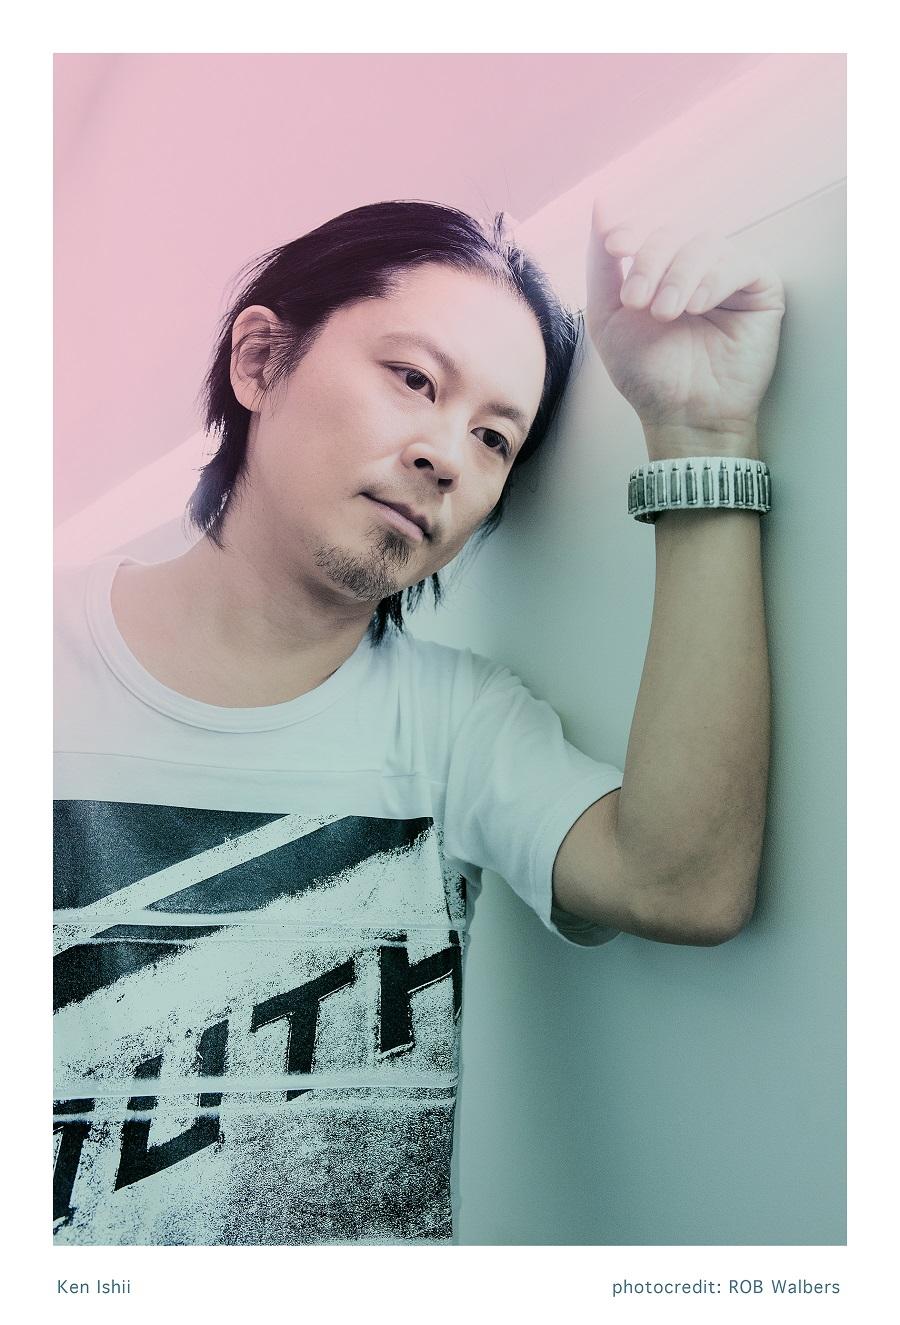 kenishii_byrobwalbers_13-klein